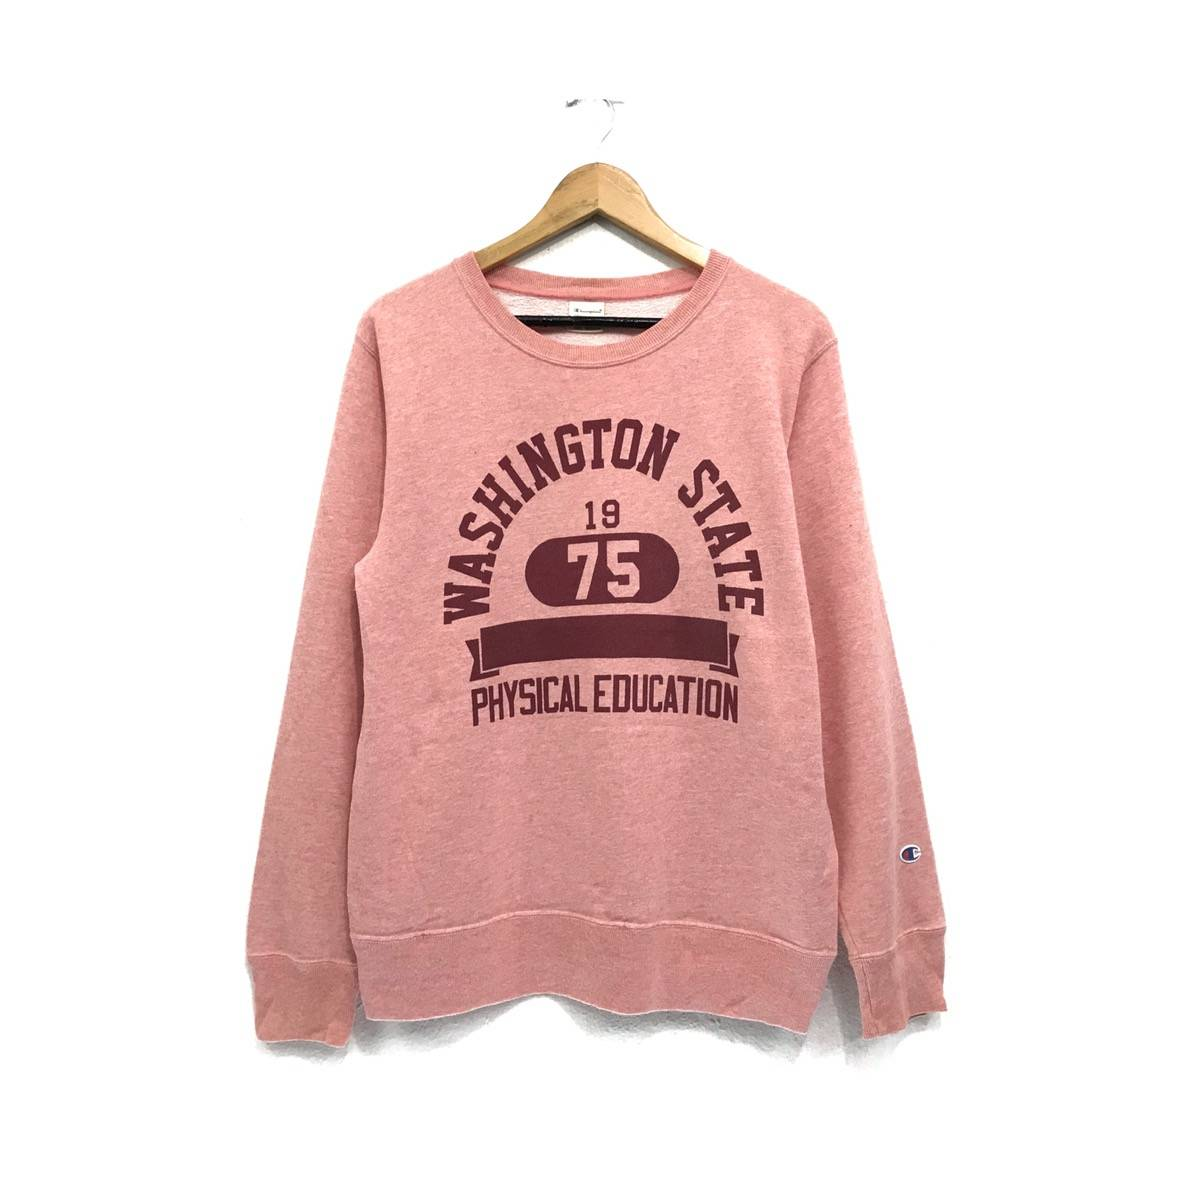 L American College Skyline sweatshirt  Skyline zip sweatshirt  American college sweatshirt  vintage USA university sweatshirt  Pro sport USA sweatshirt